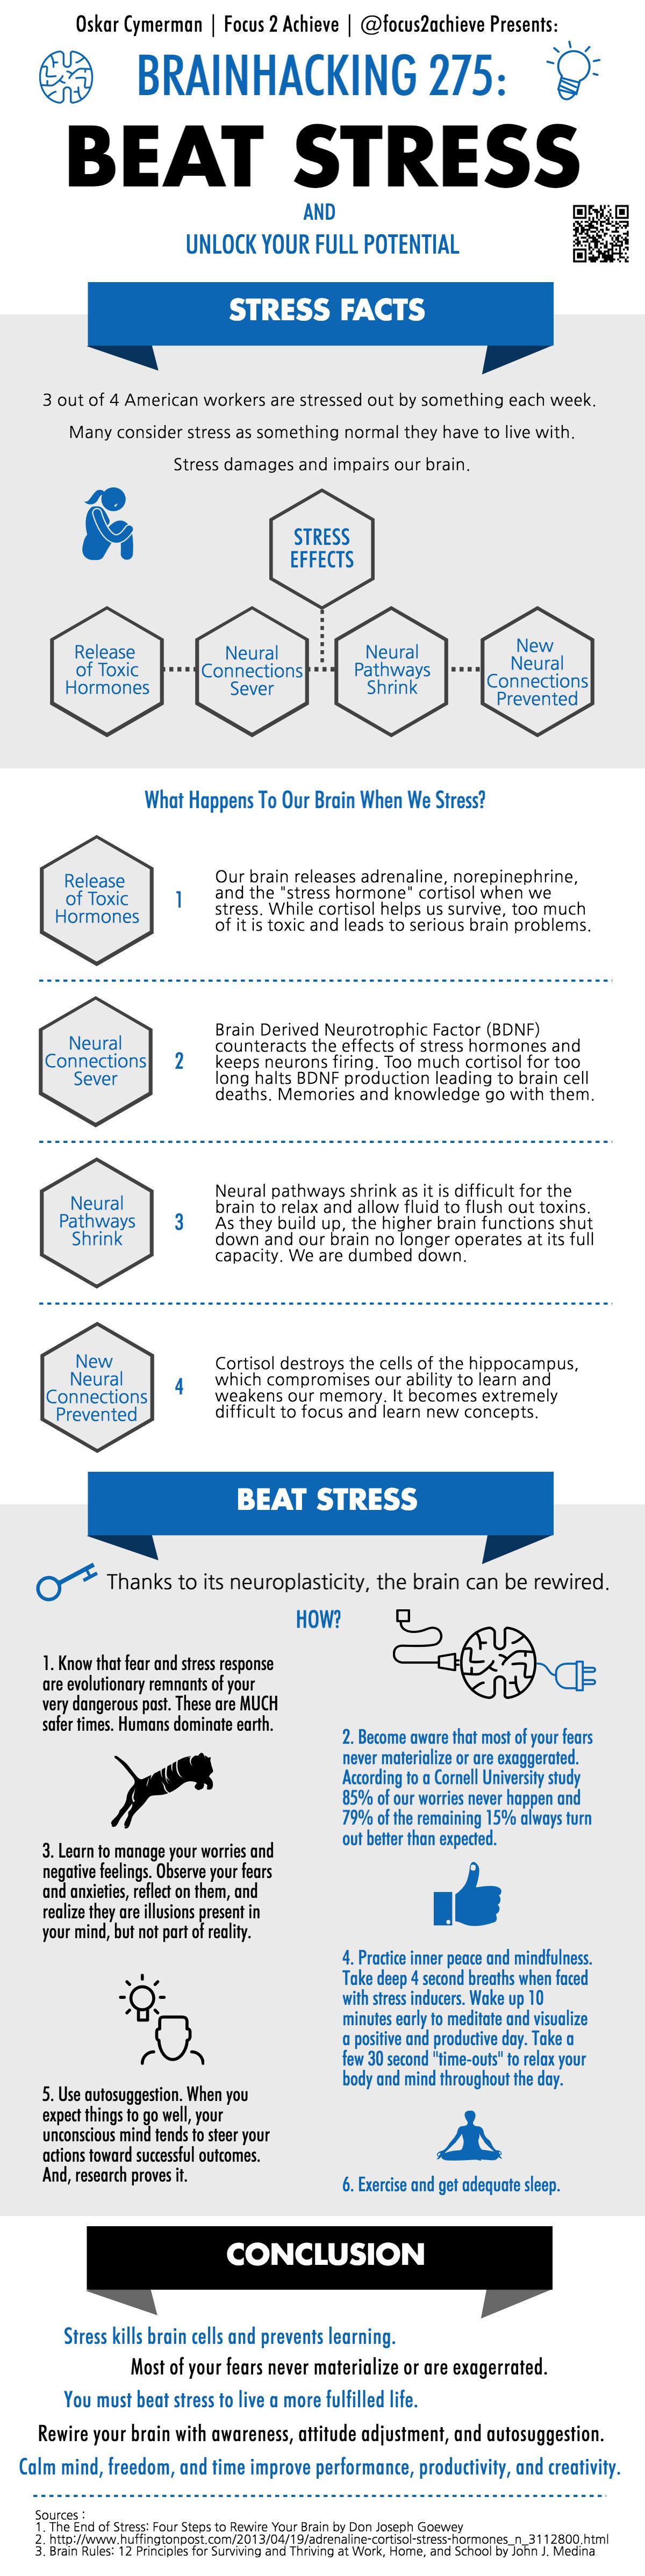 Beat Stress Infographic